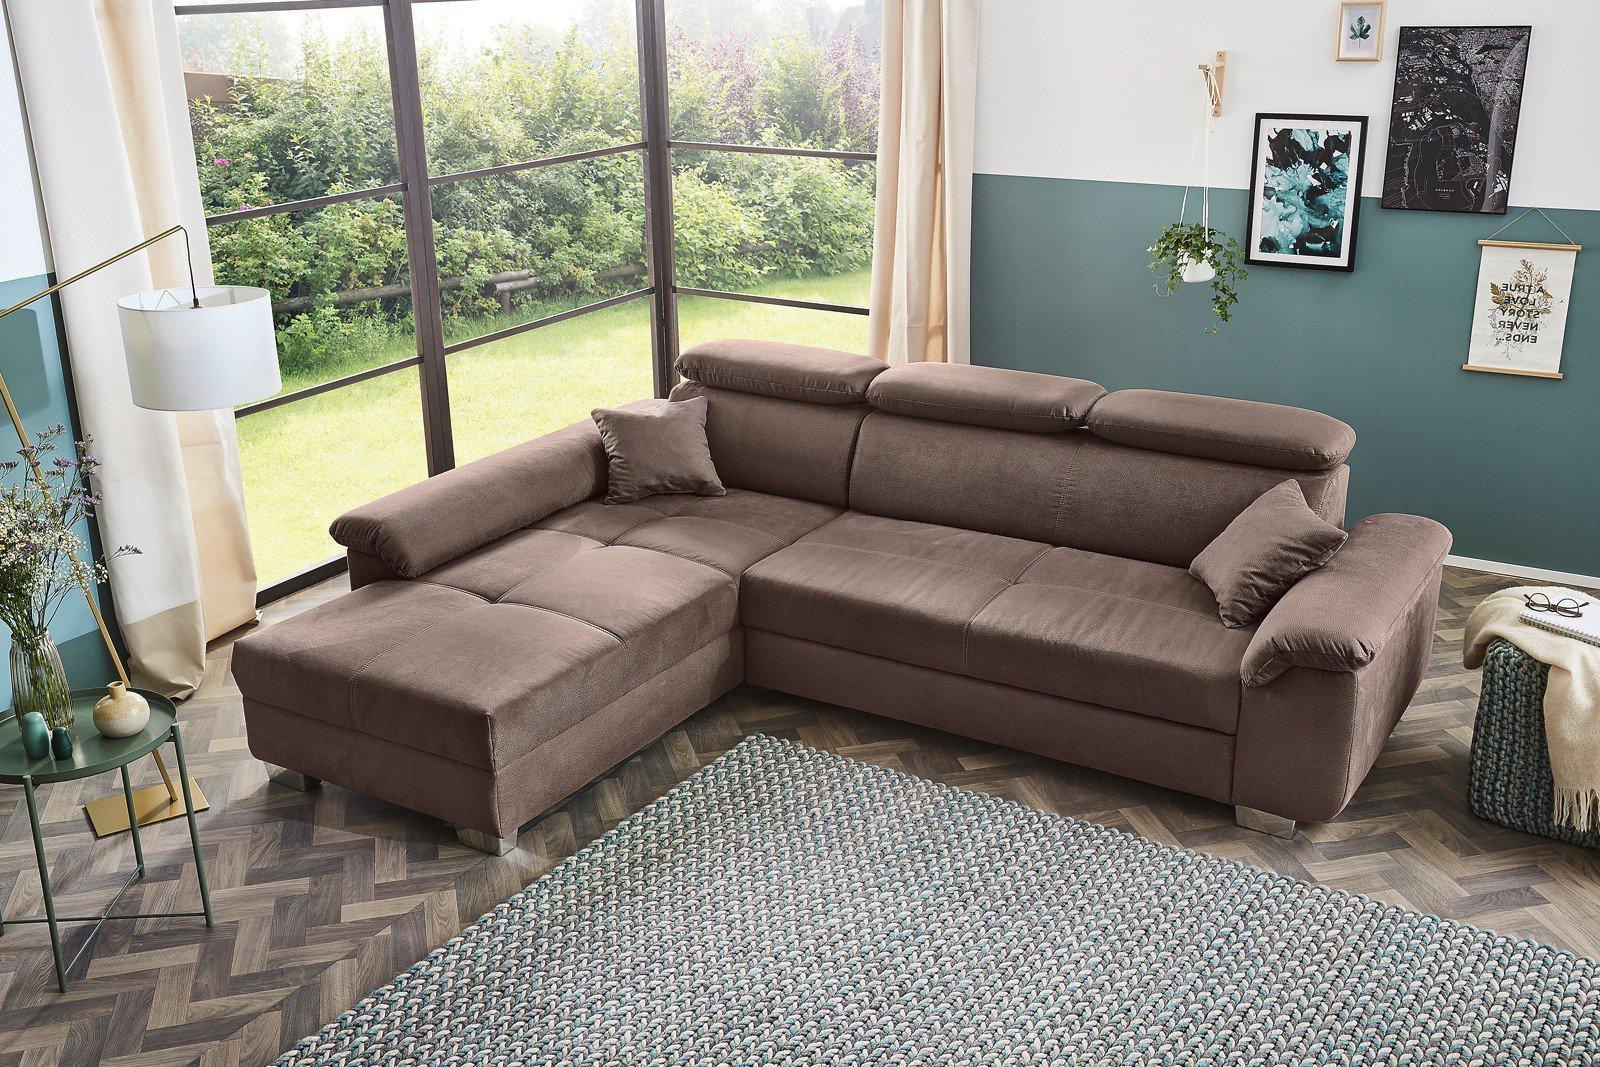 jockenh fer landshut eckgarnitur braun m bel letz ihr online shop. Black Bedroom Furniture Sets. Home Design Ideas